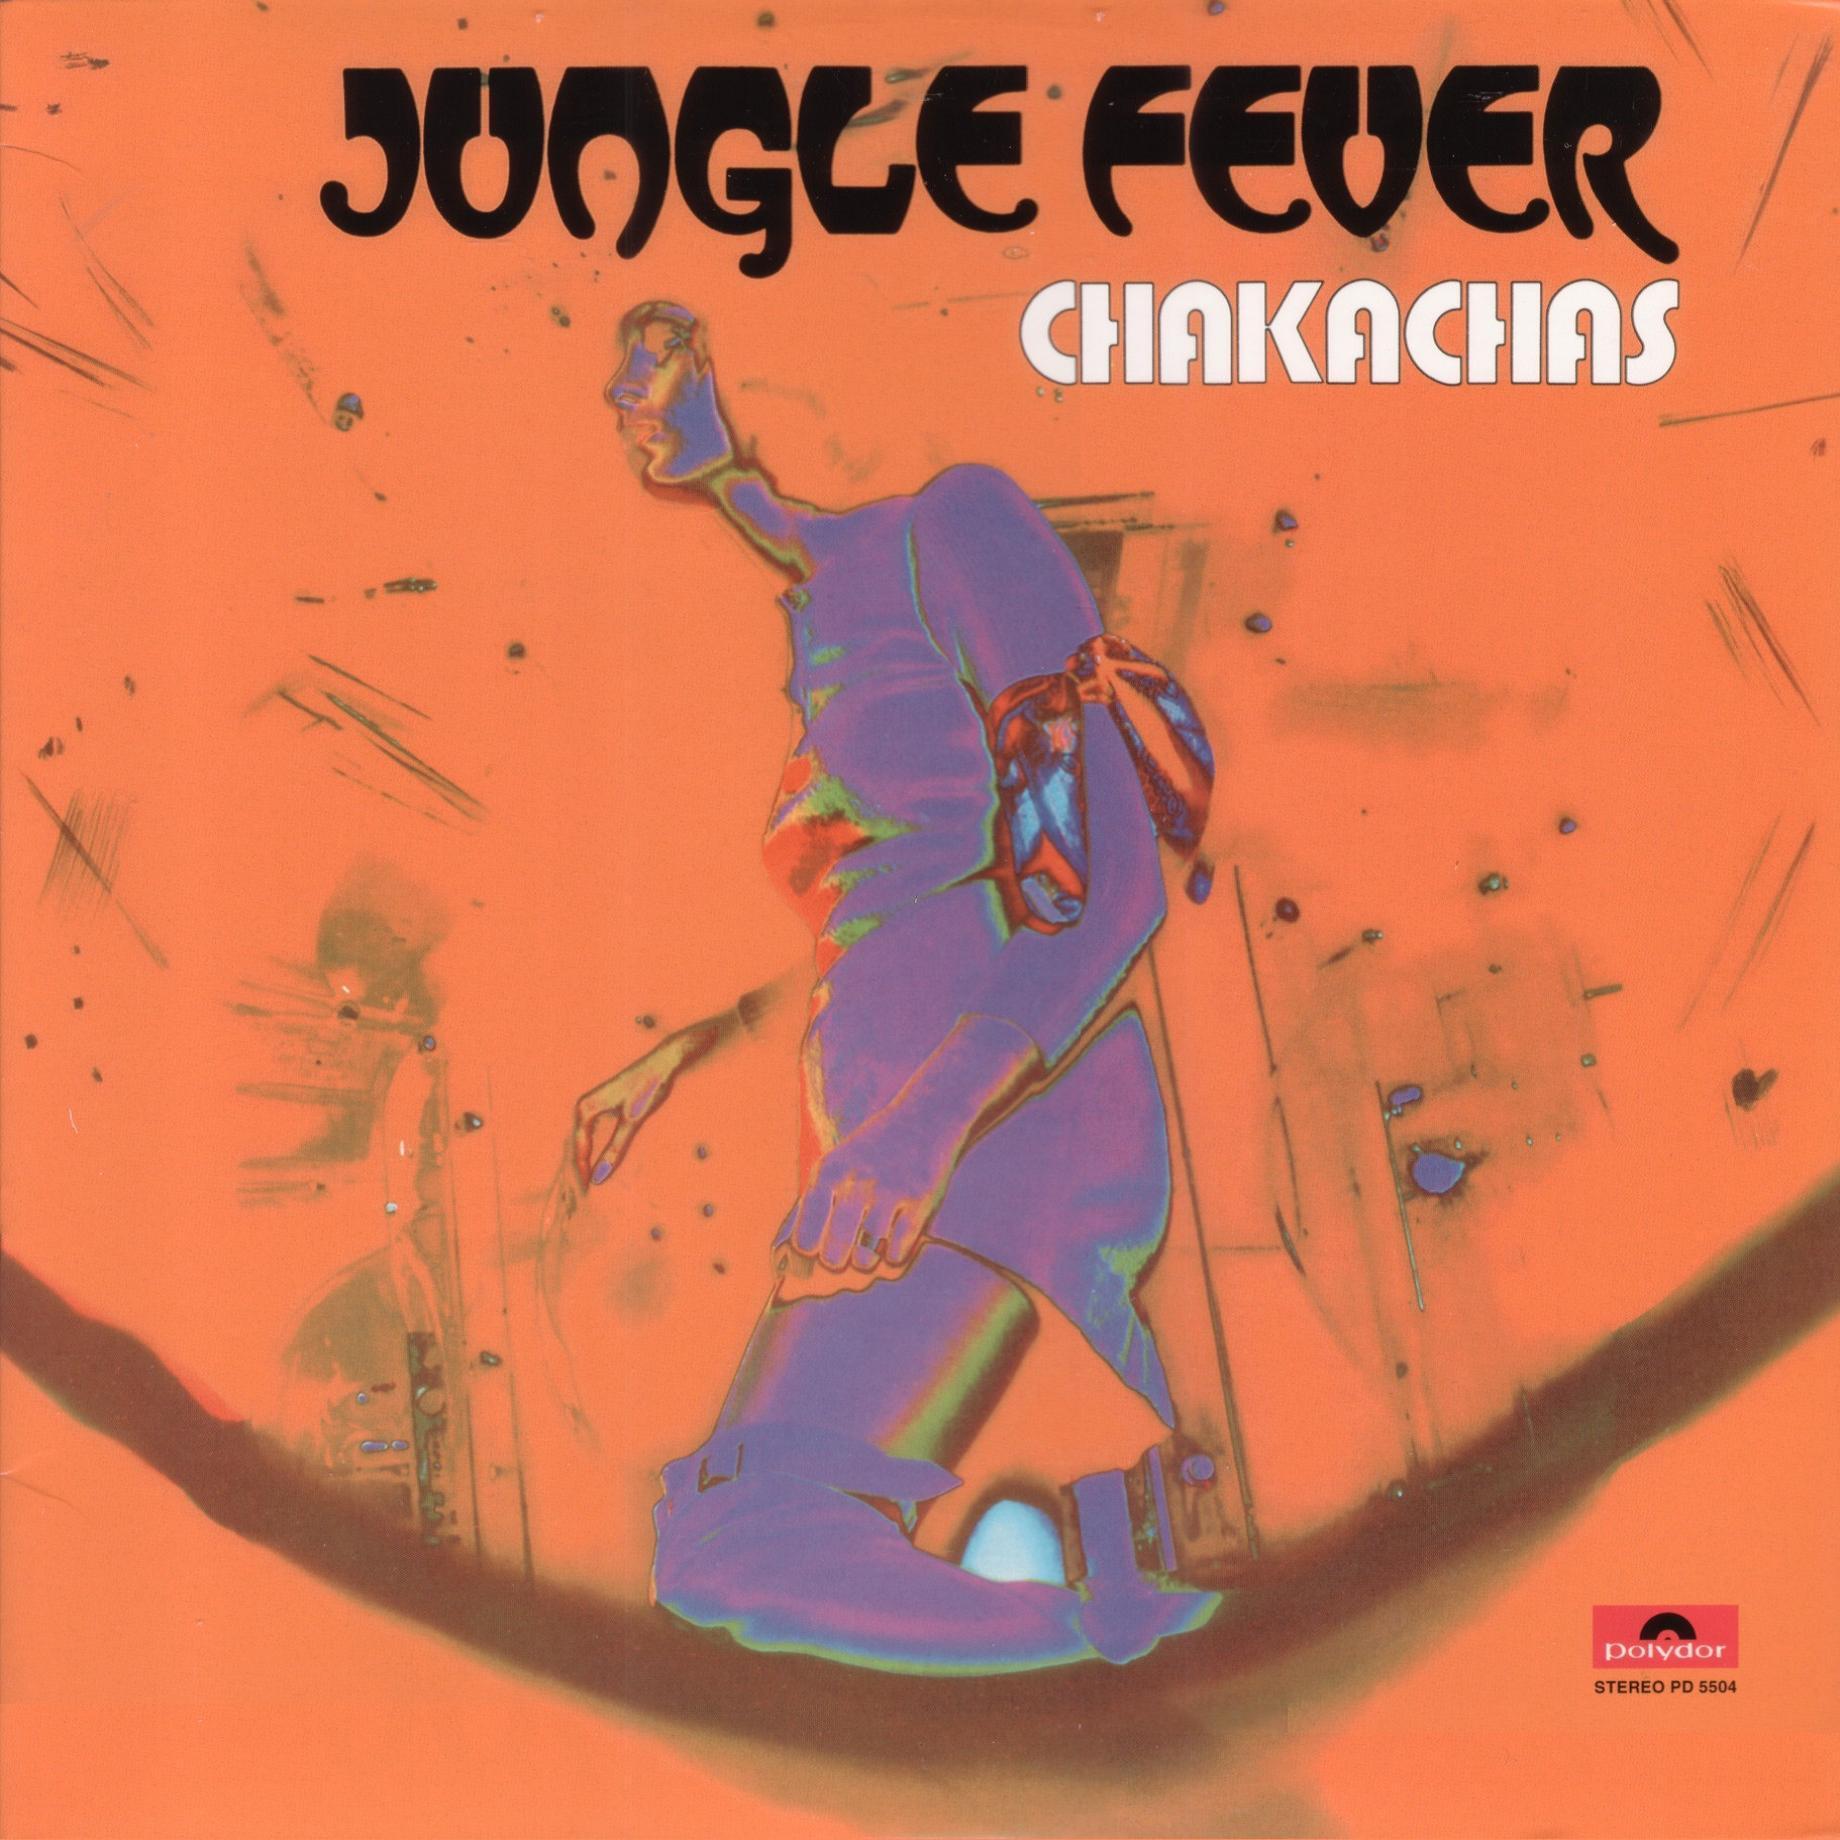 chakachas jungle fever lp front